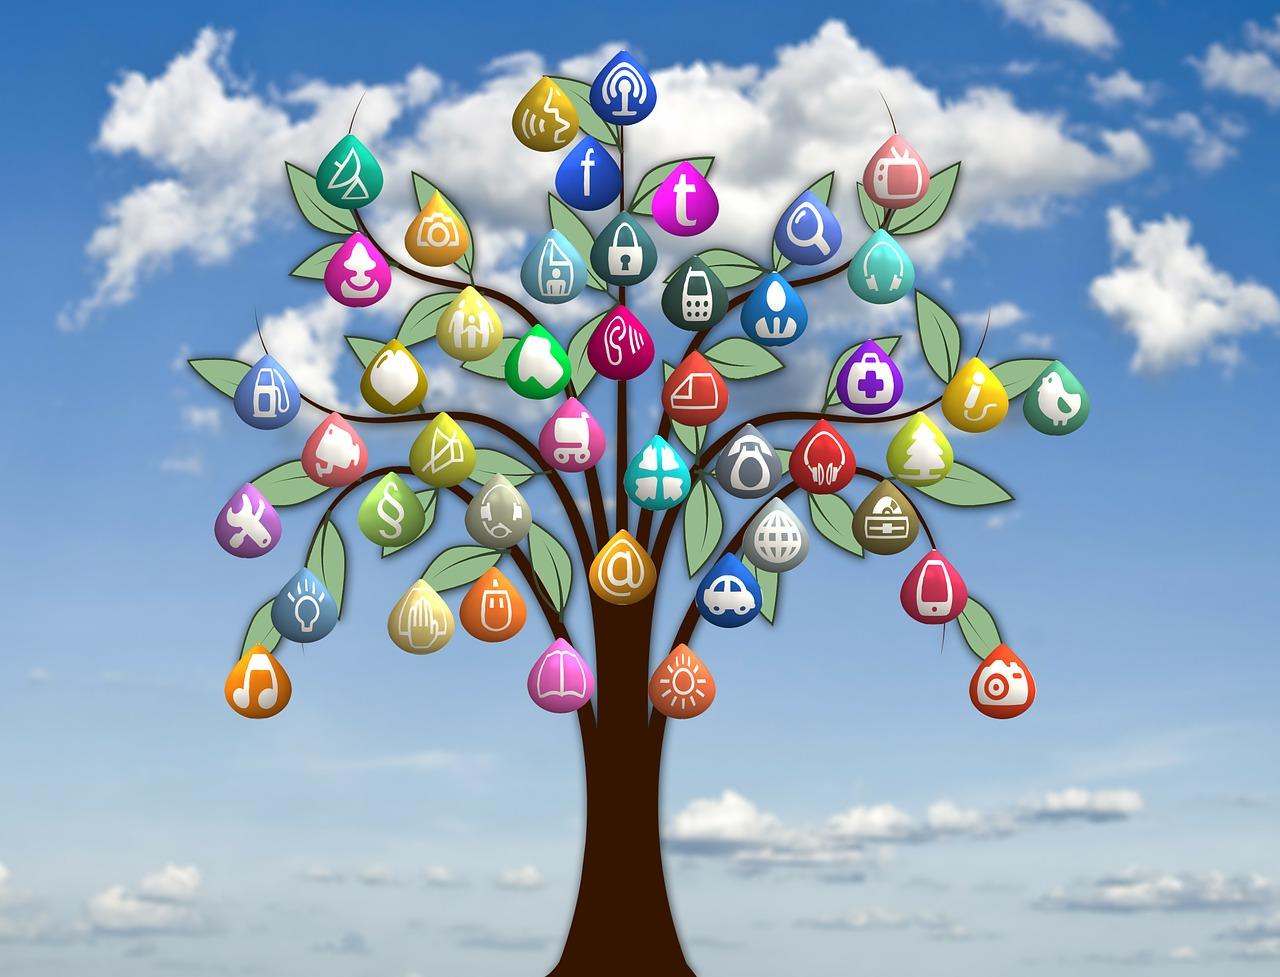 tree-240470_1280 (2)